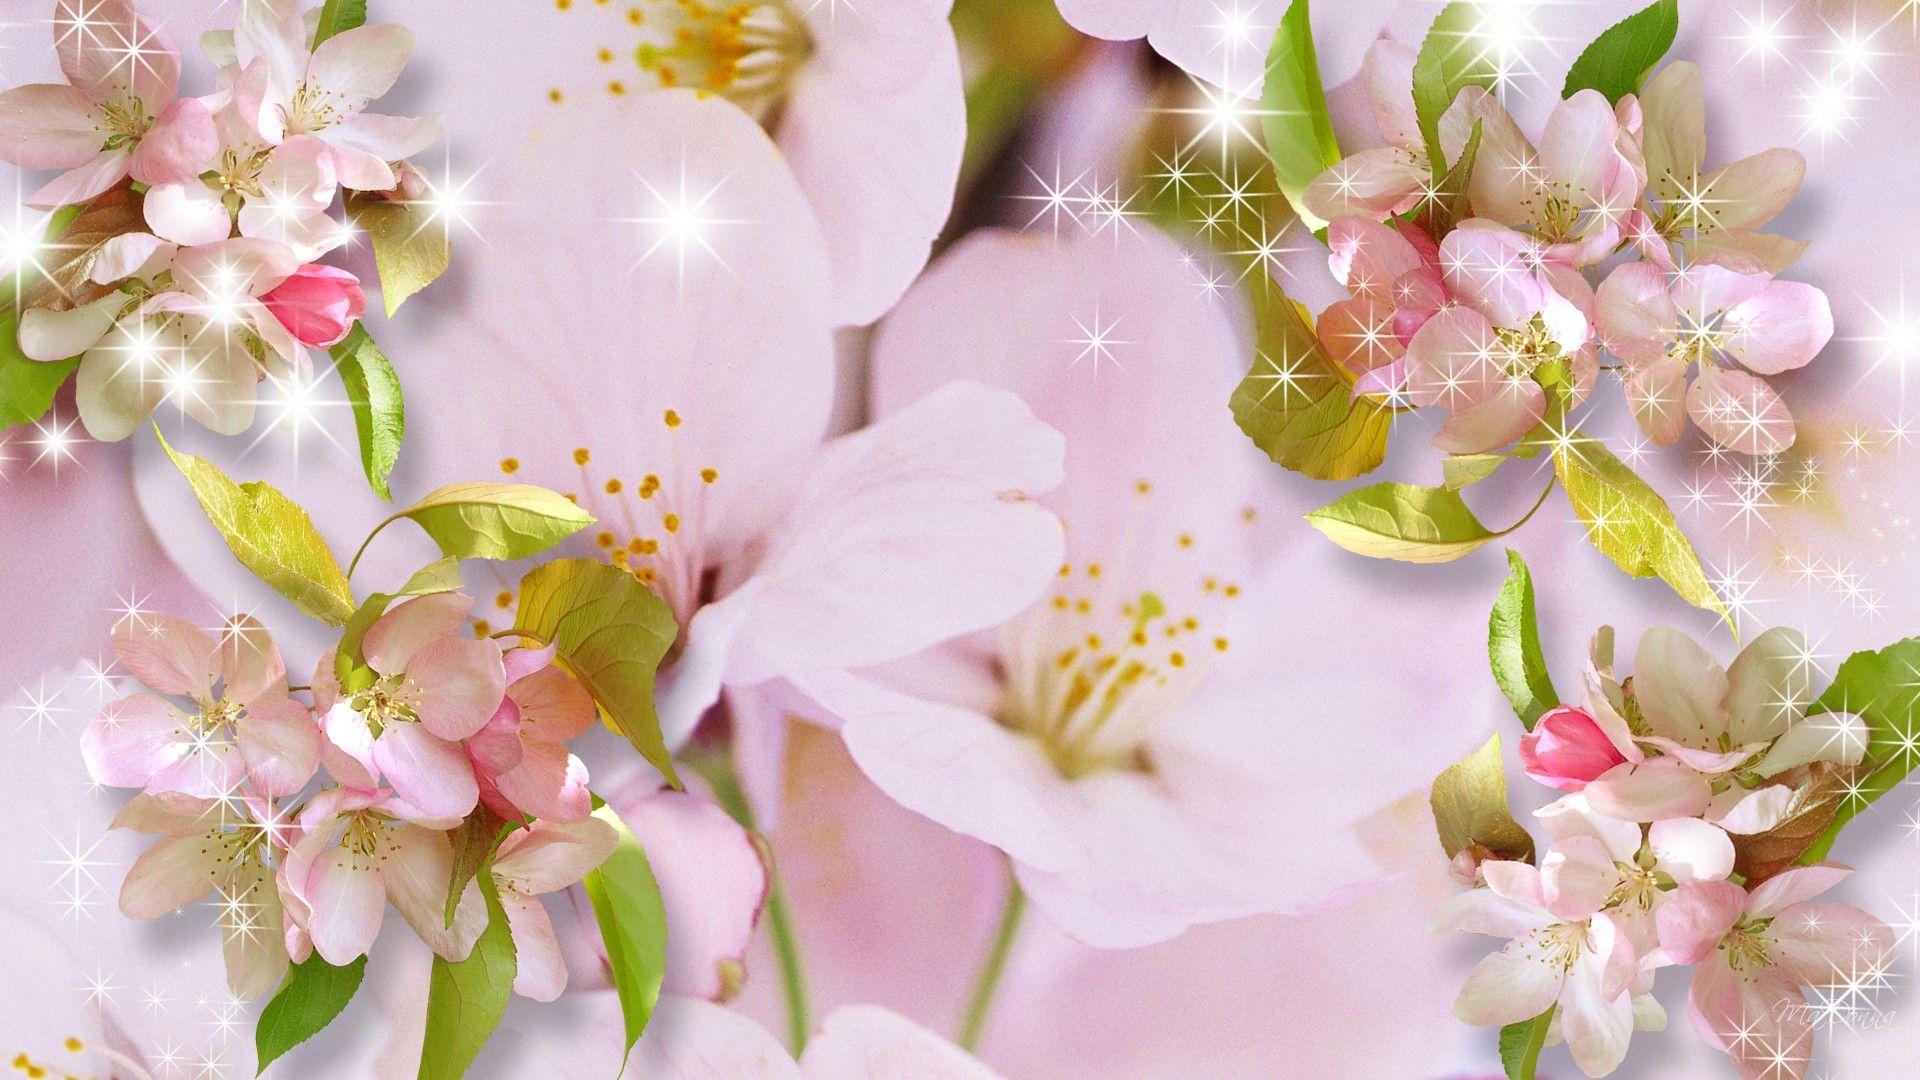 Hd Essence Of Sakura Wallpaper, Spring, Firefox Persona, - Bunga Sakura Khas Jepang , HD Wallpaper & Backgrounds